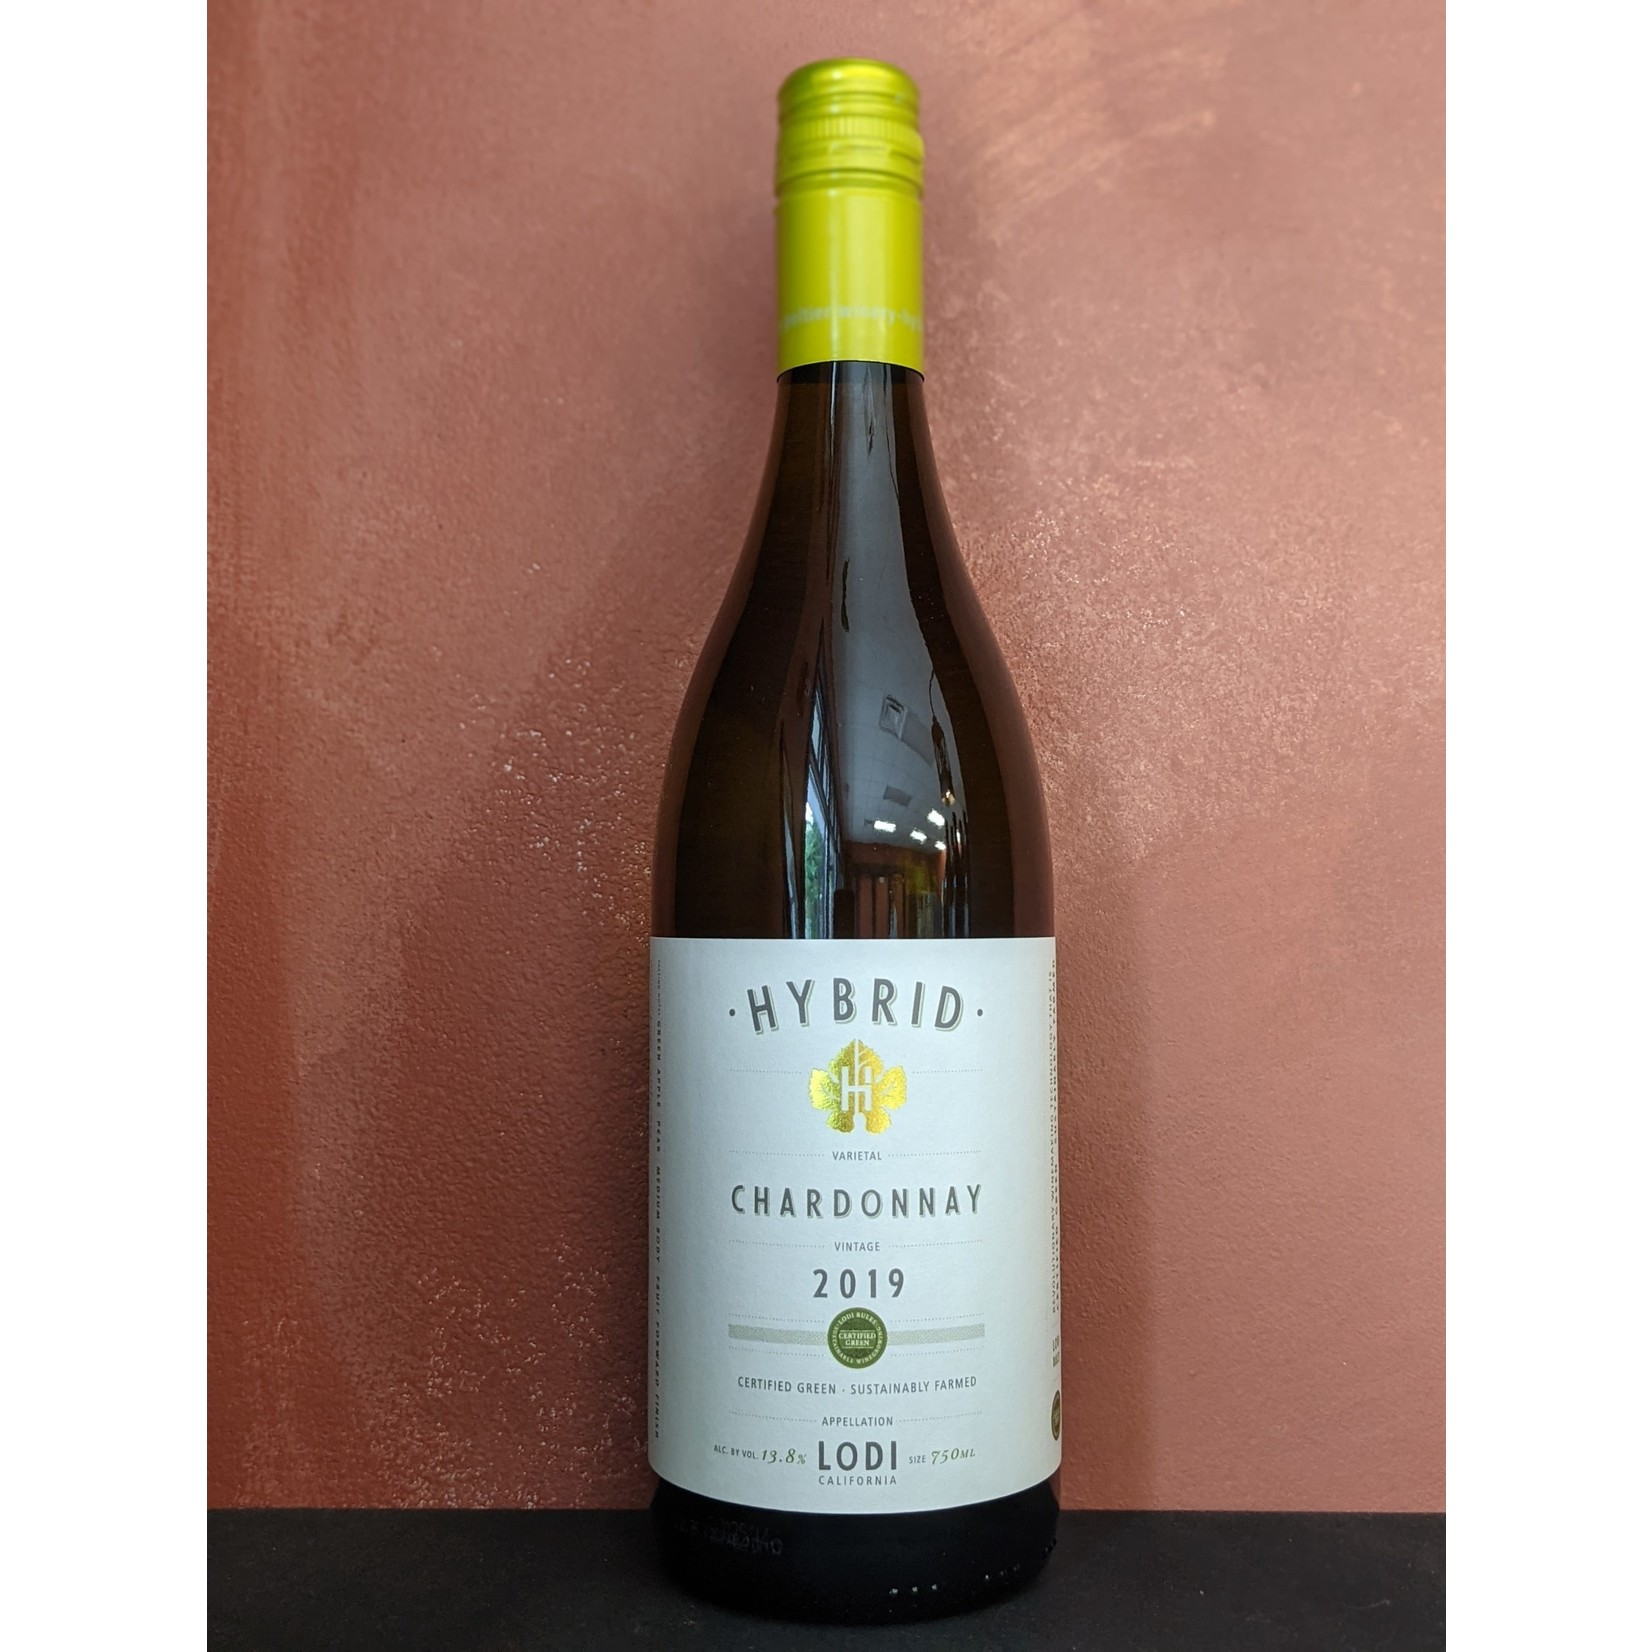 2019 Chardonnay, Hybrid Wines